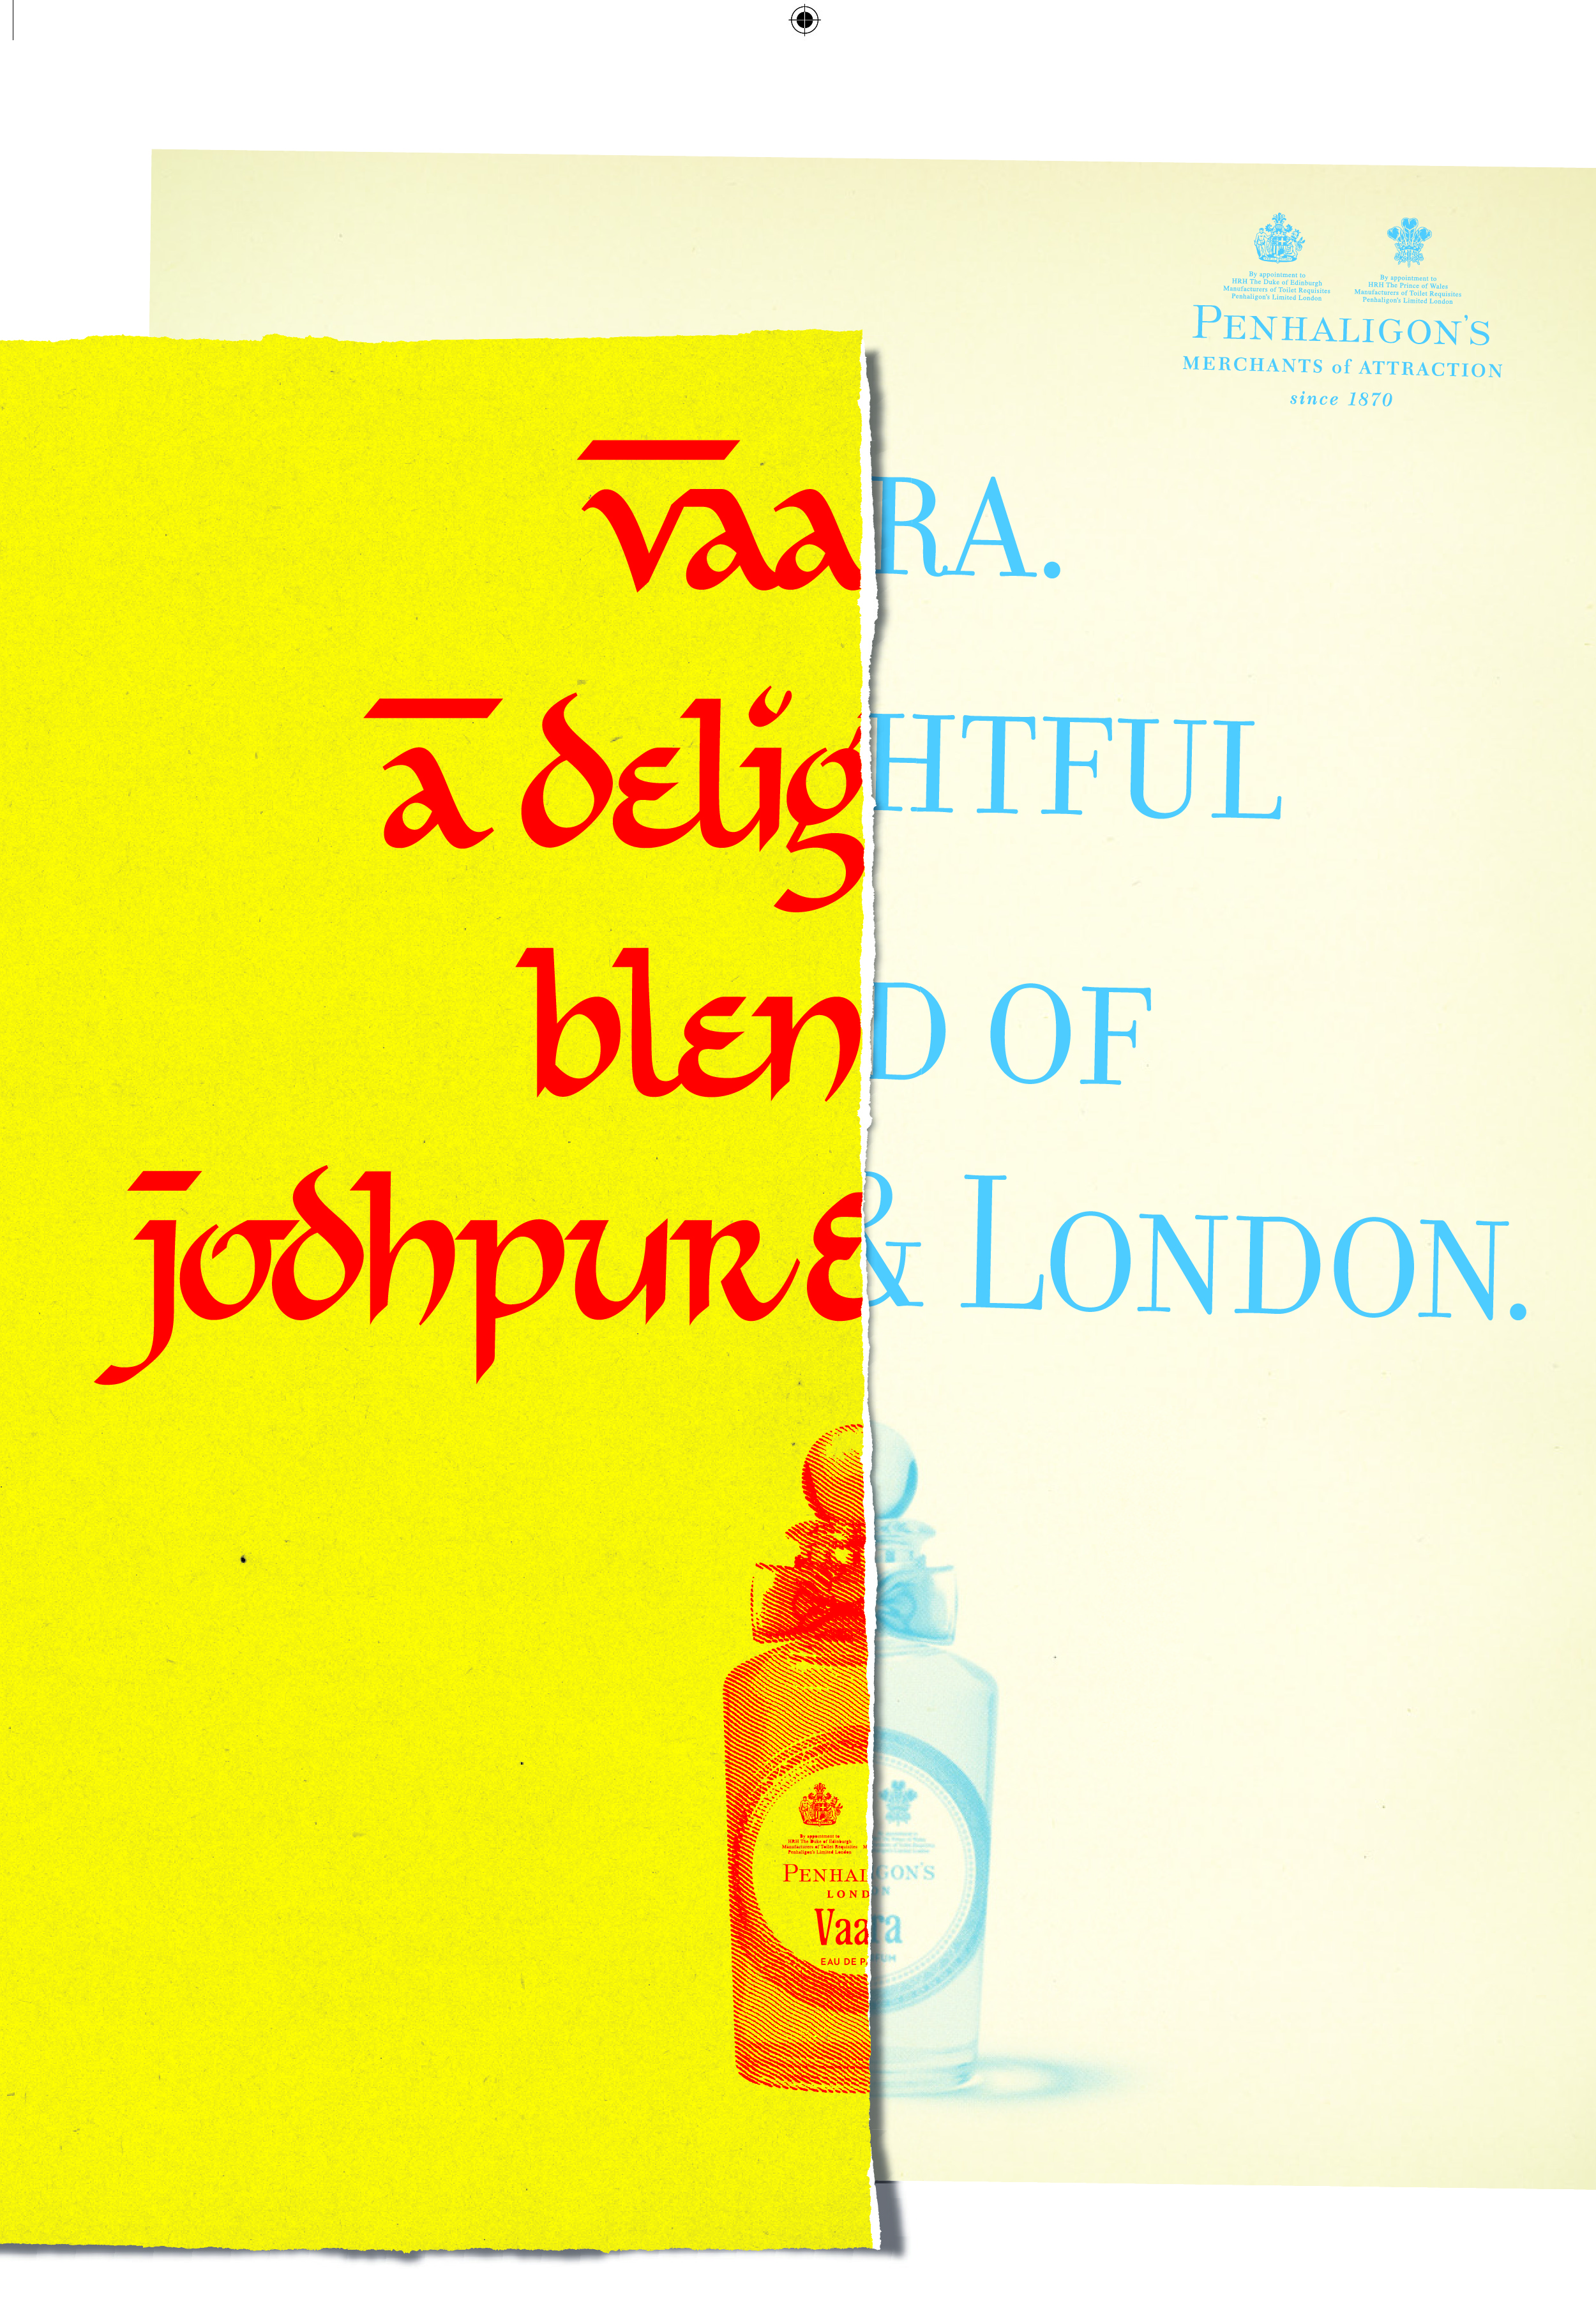 3. 'A Delightful Blend' Penhaligon's, Vaara, DHM.jpg